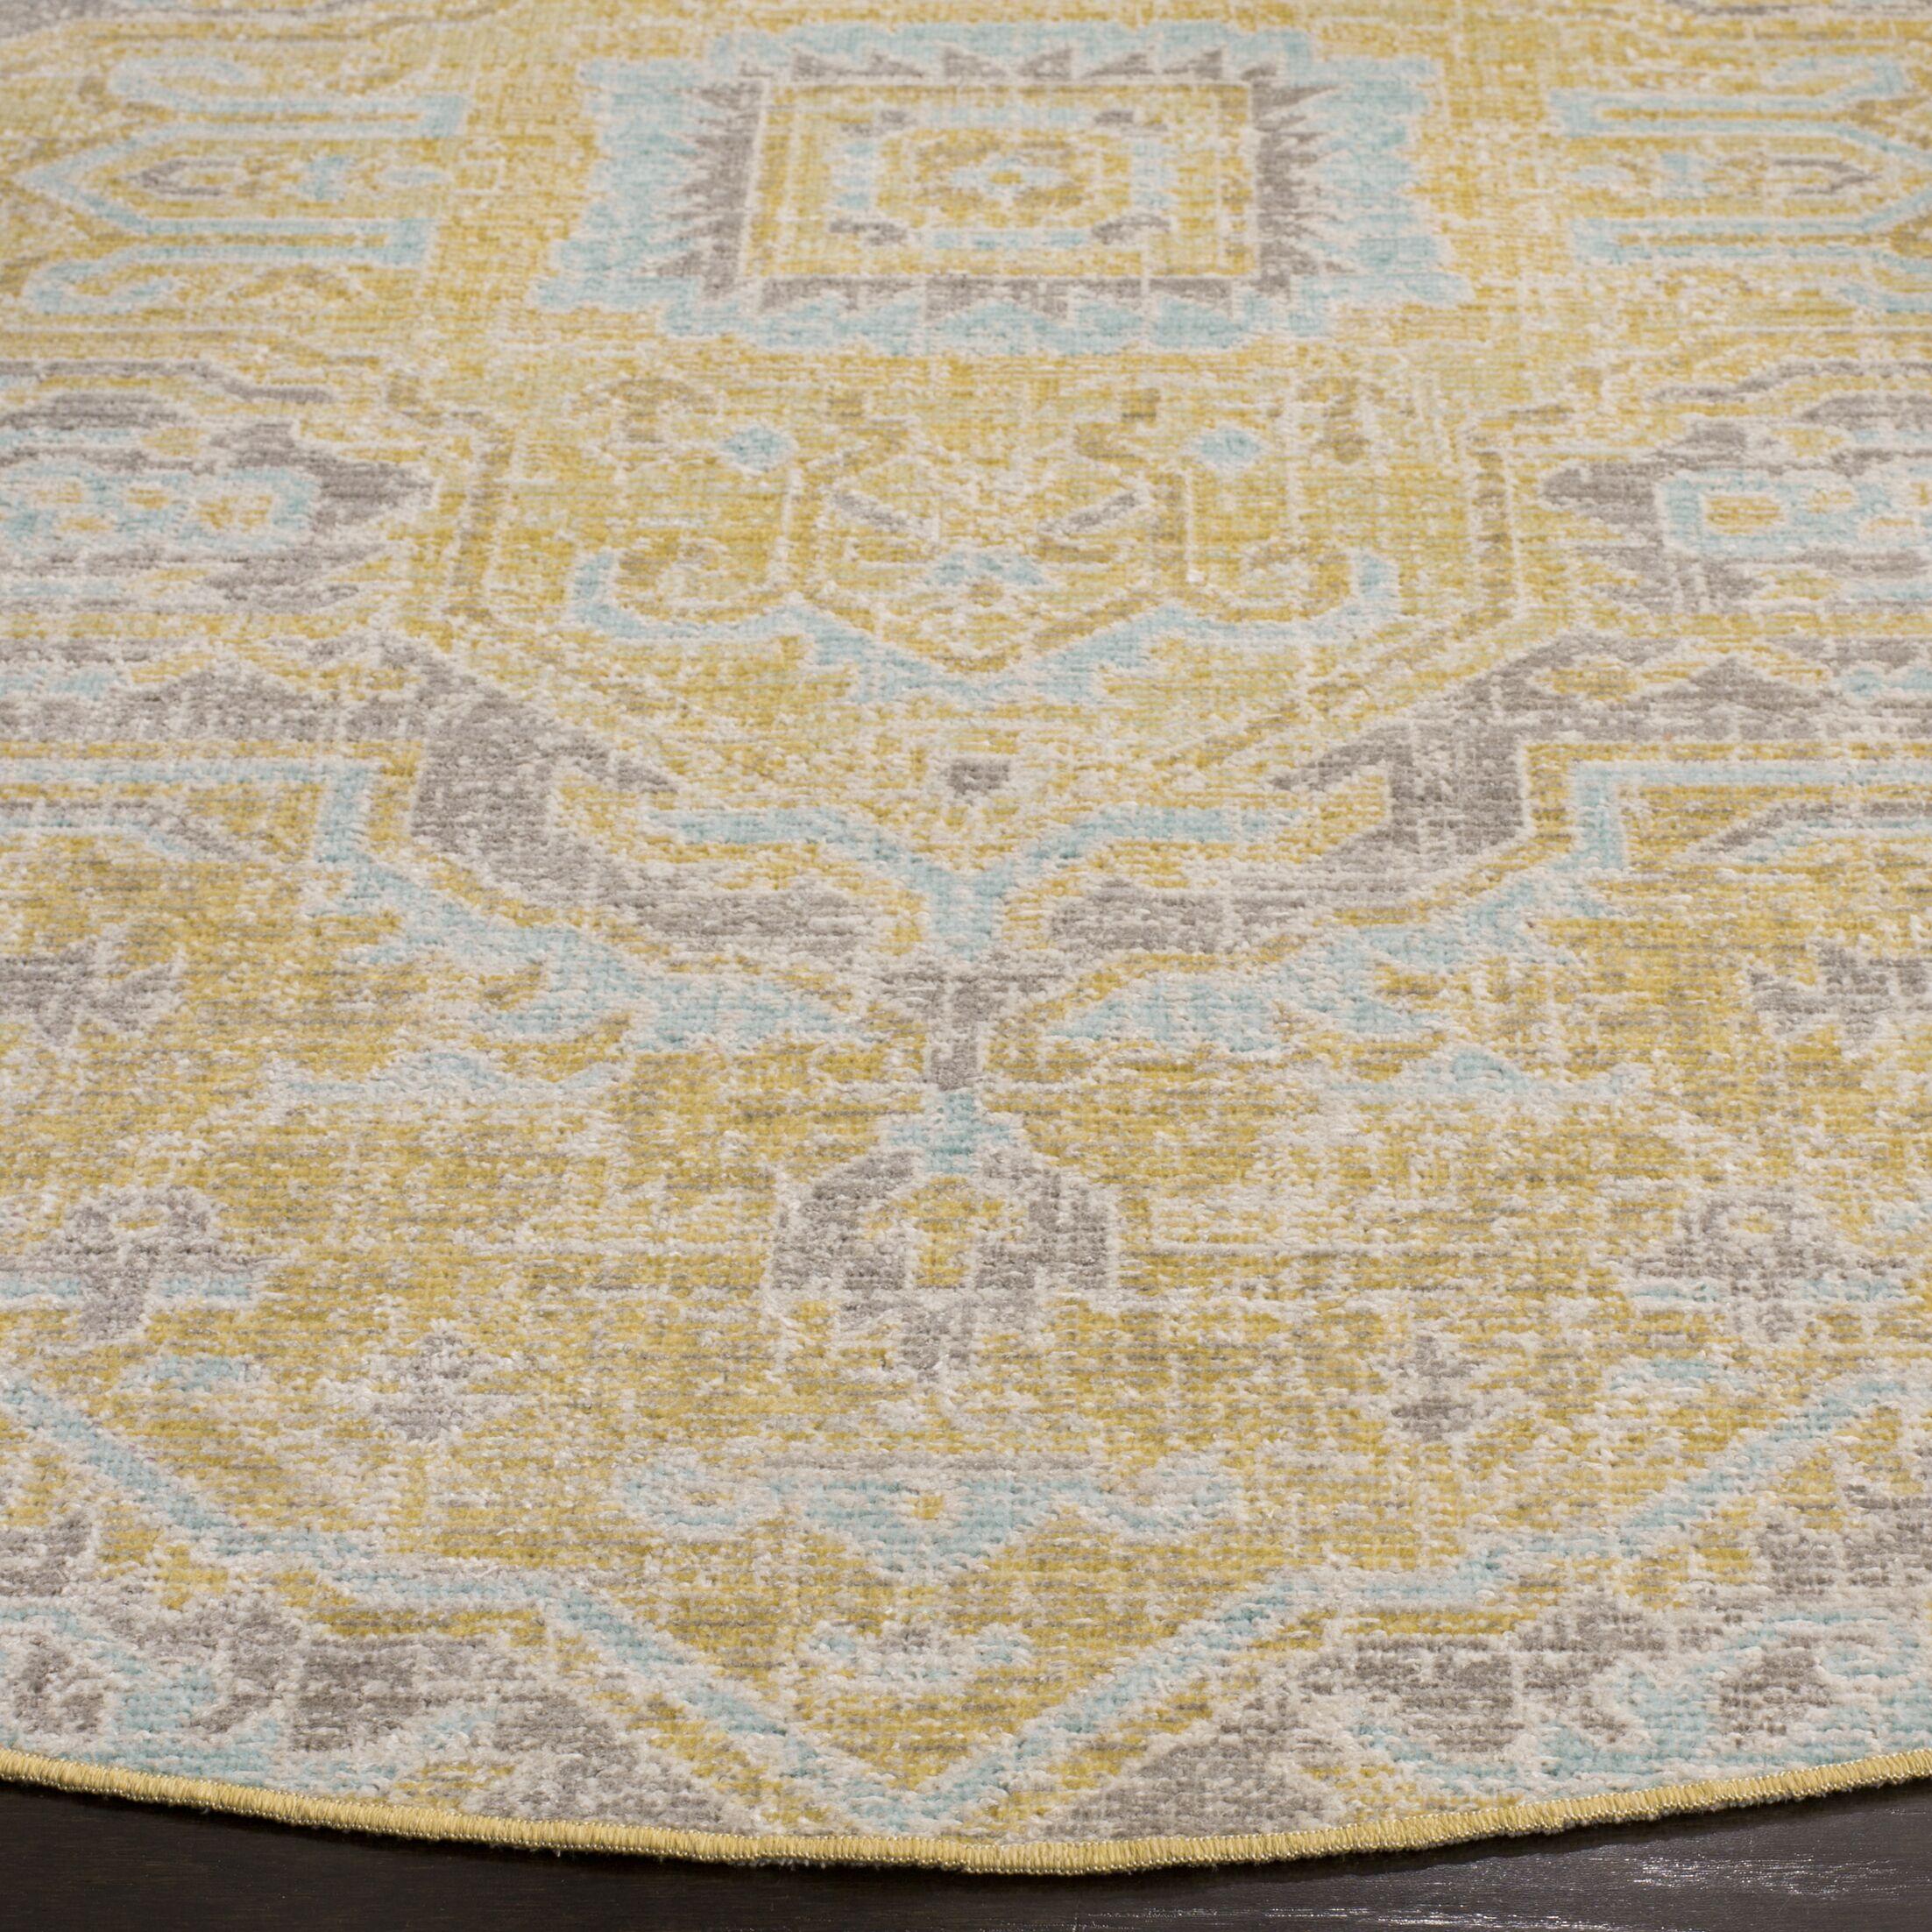 Chauncey Light Gray Area Rug Rug Size: Rectangle 3' x 10'